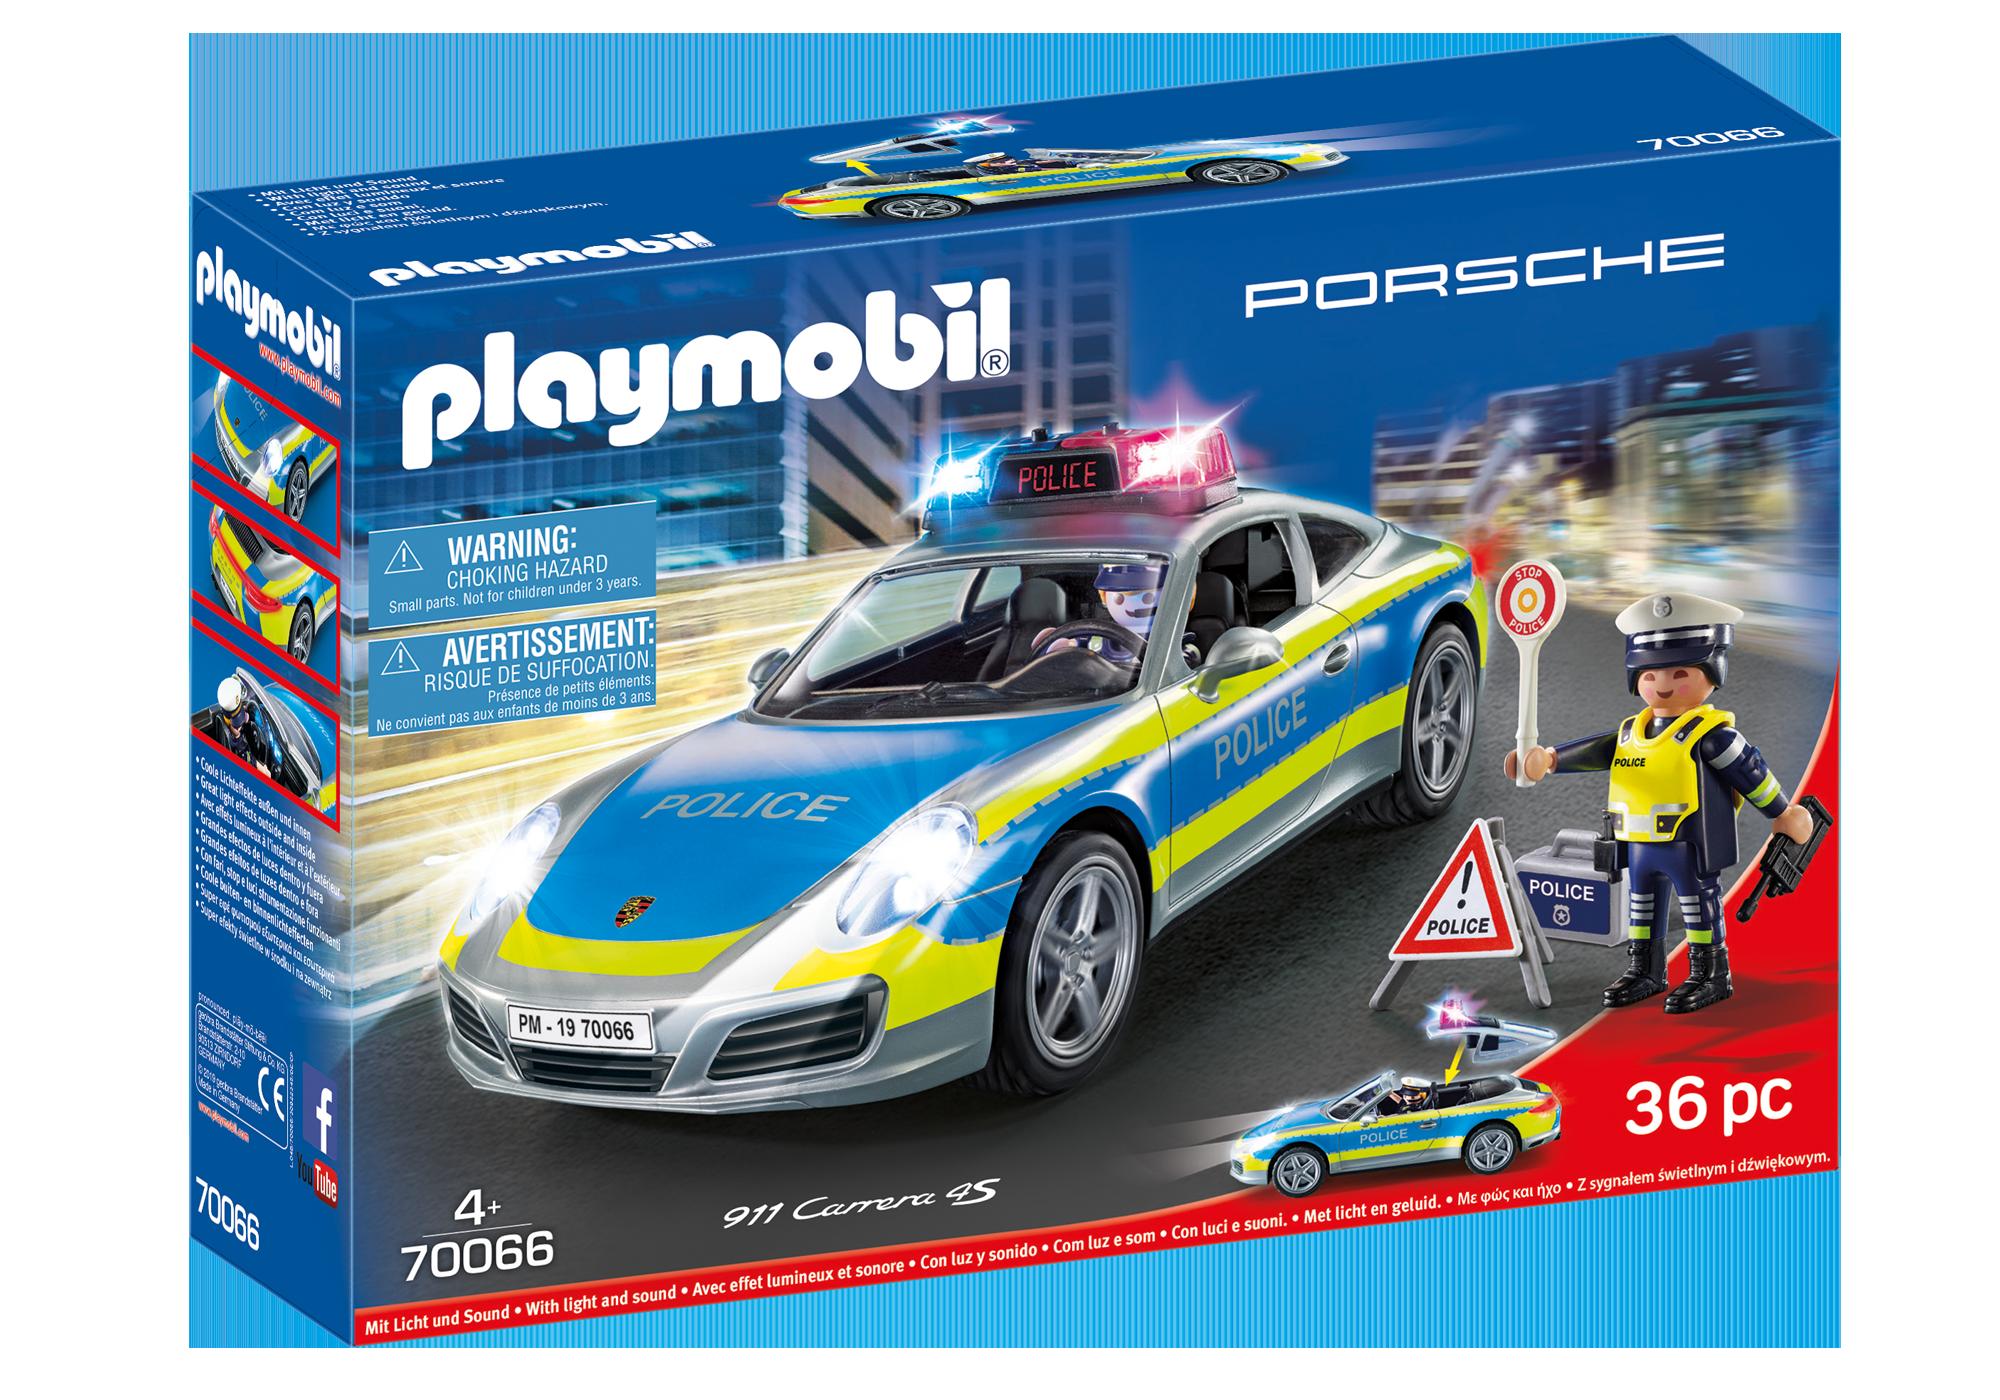 http://media.playmobil.com/i/playmobil/70066_product_box_front/Porsche 911 Carrera 4S Politi